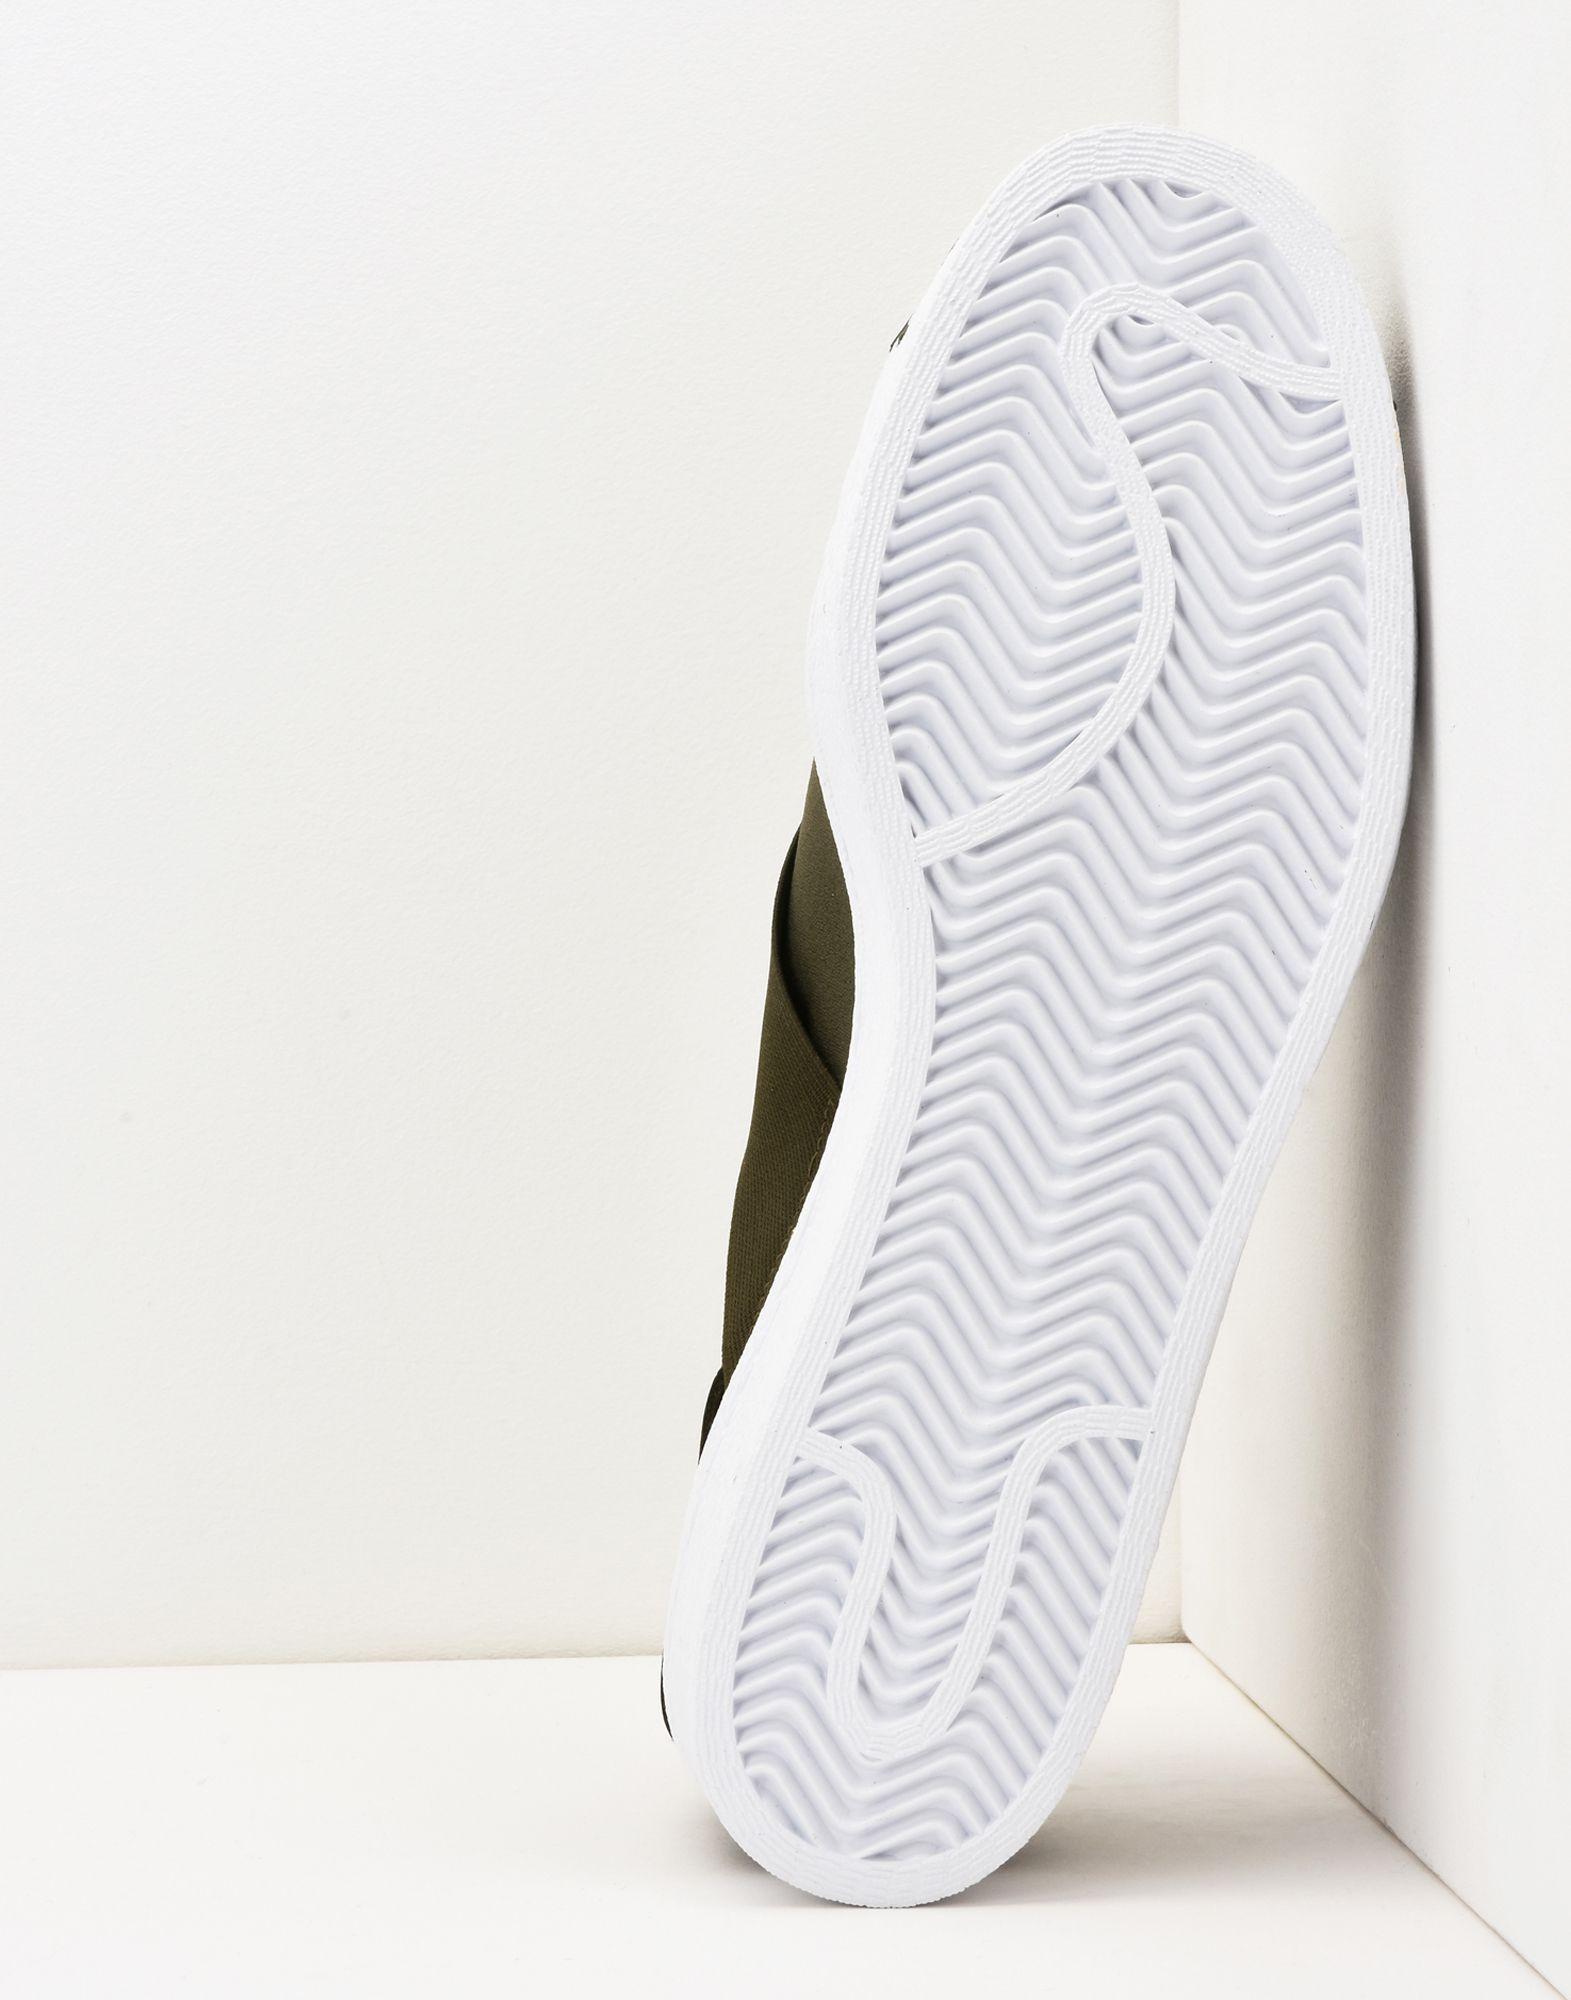 Sneakers Adidas Originals Superstar Slipon - Homme - Sneakers Adidas Originals sur